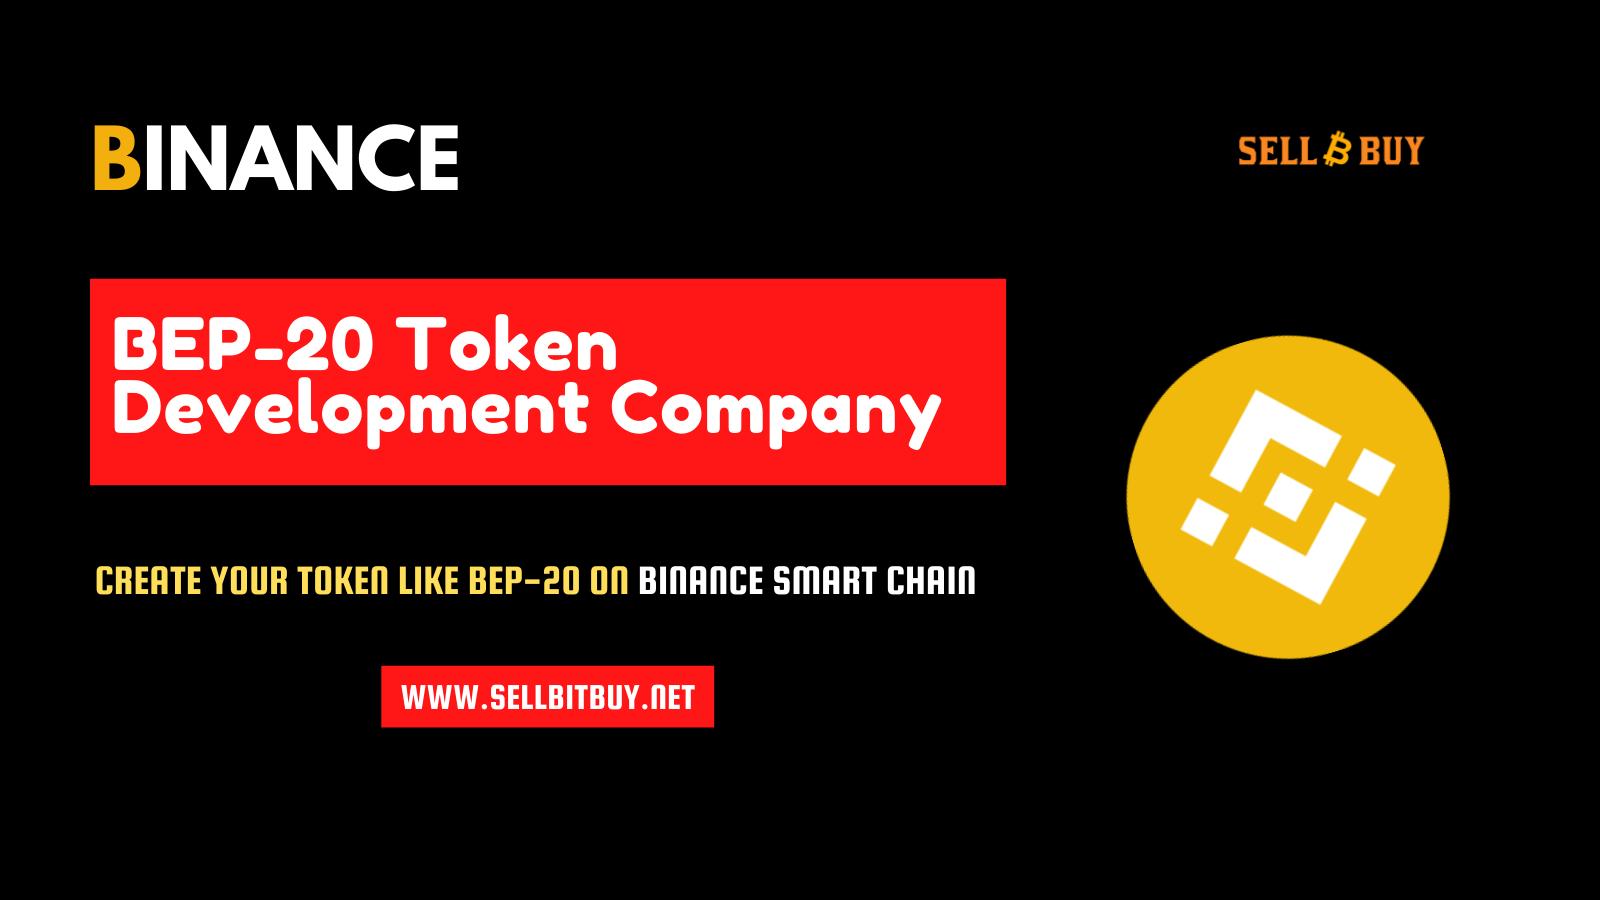 Binance Smart Chain BEP20 Token Development - To Build Your Own BEP20 Token On BSC